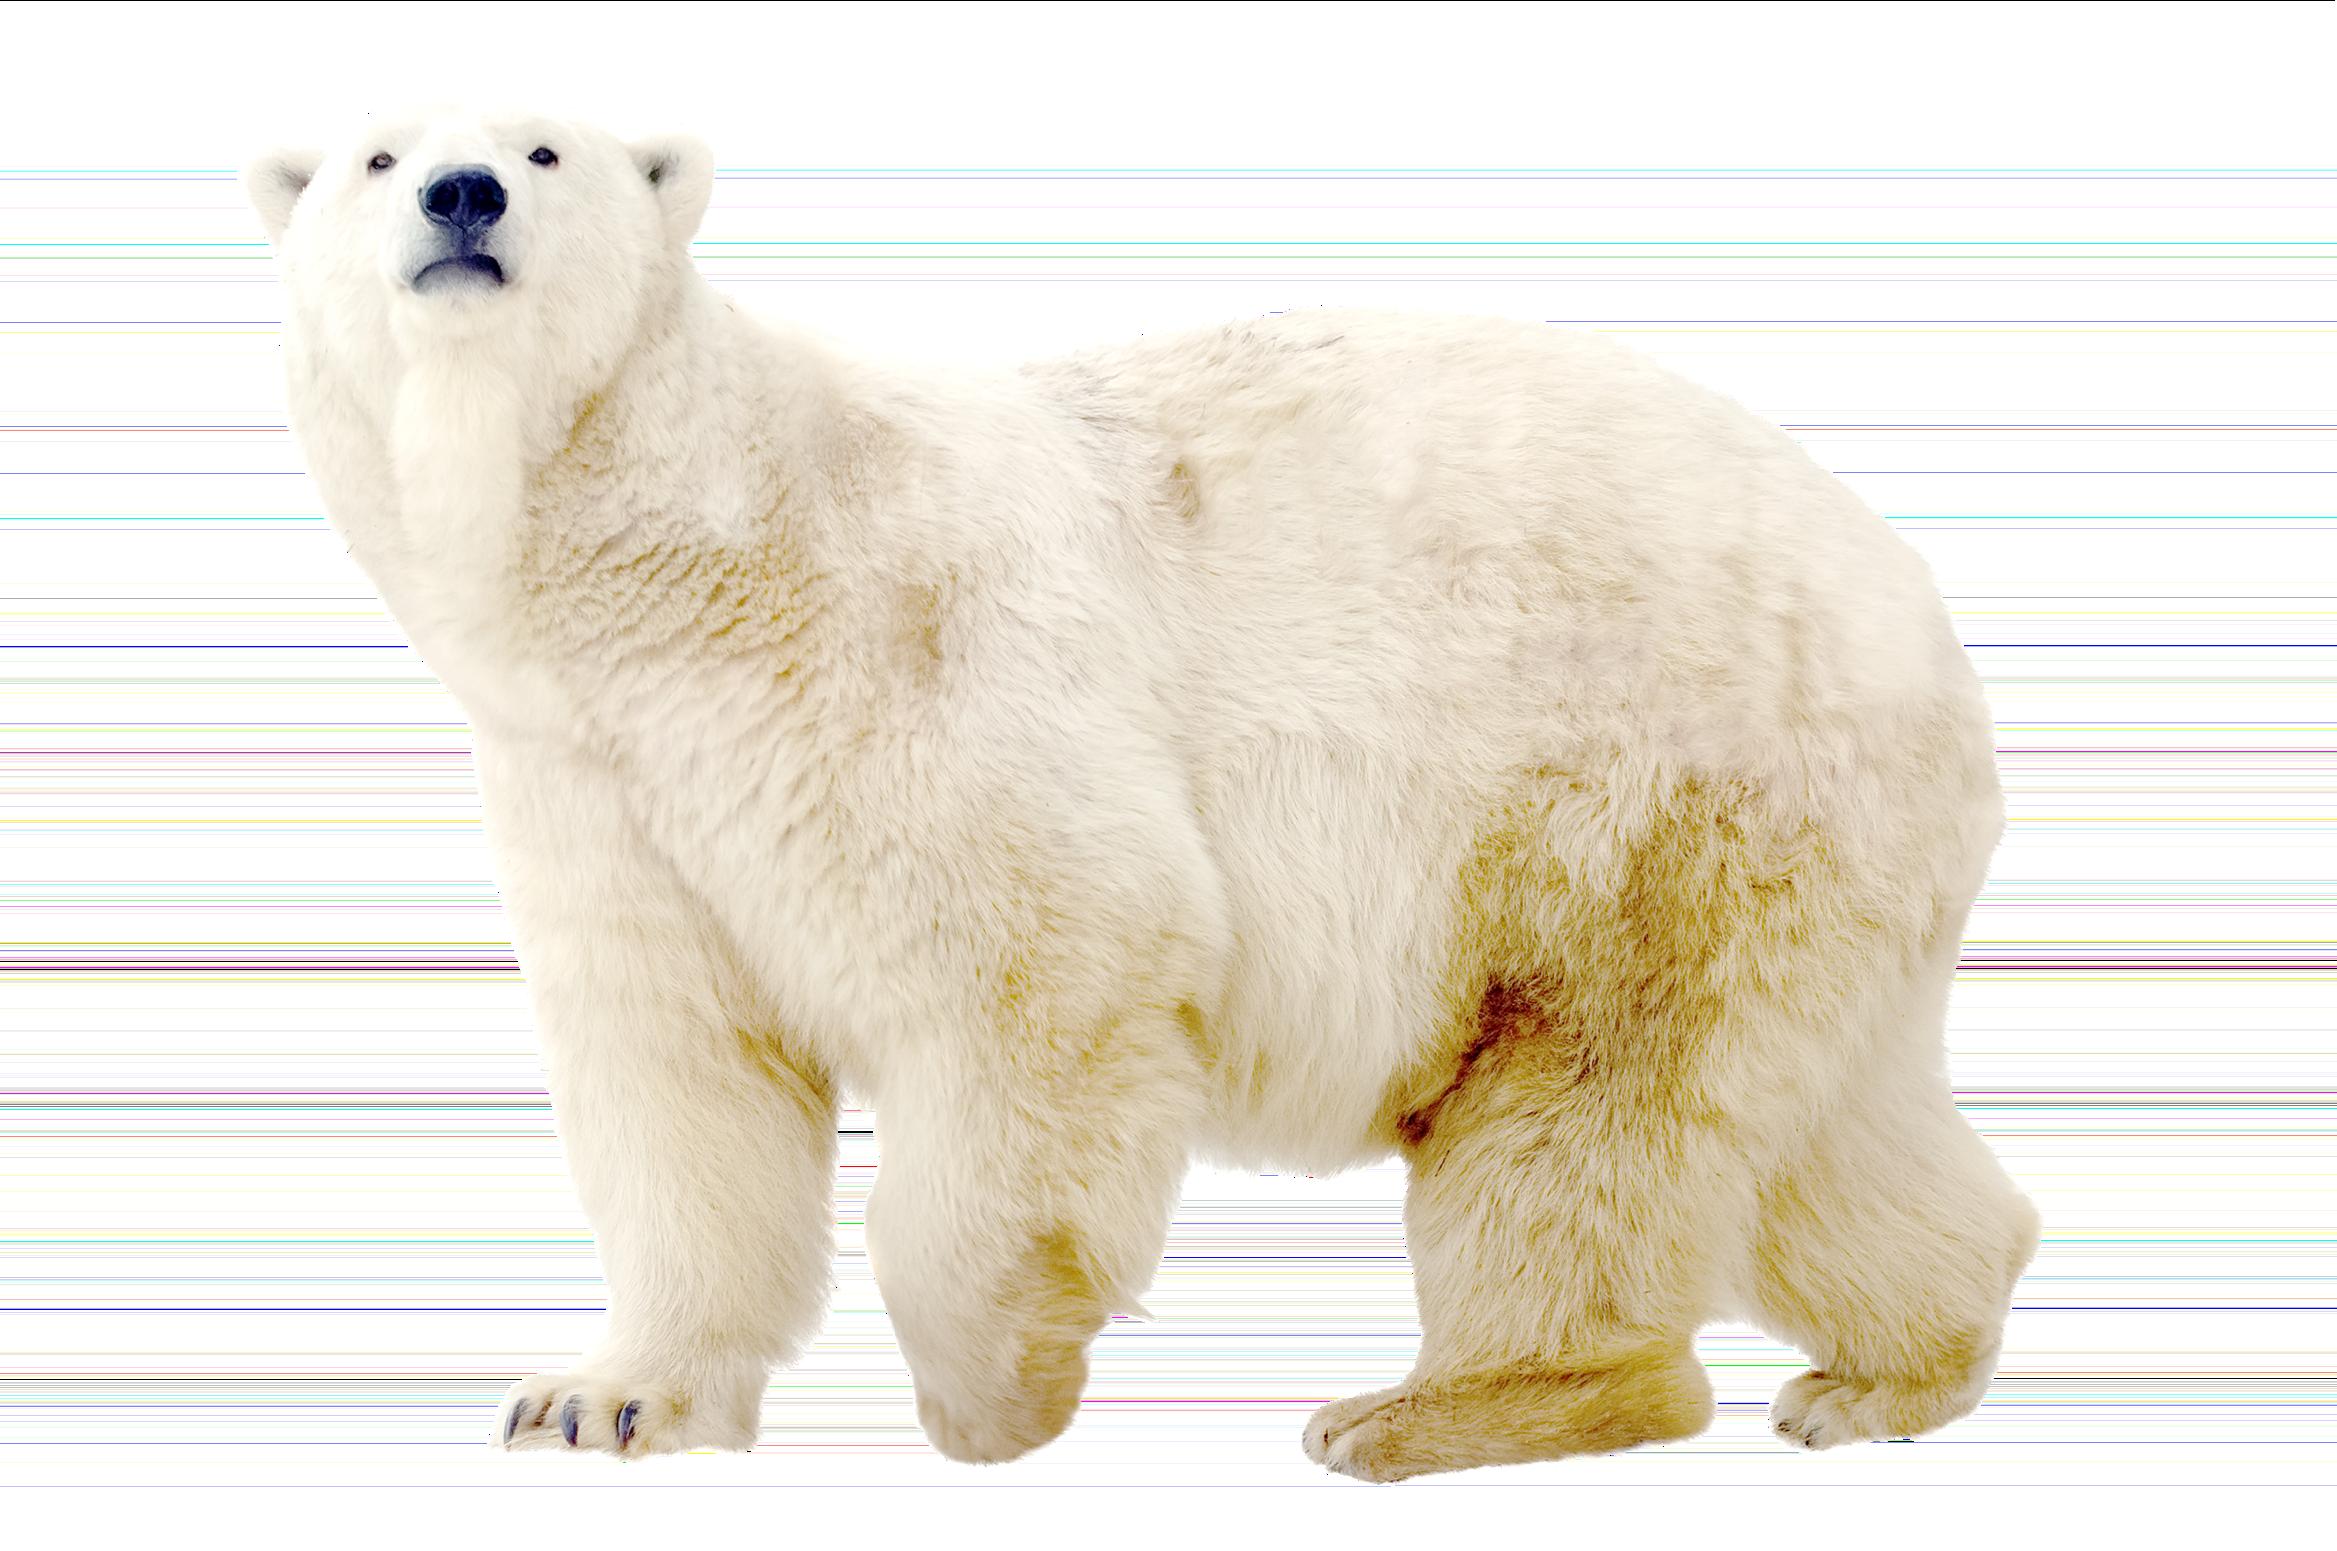 jpg royalty free library Polar bear clipart free. Double exposure effect pixelmator